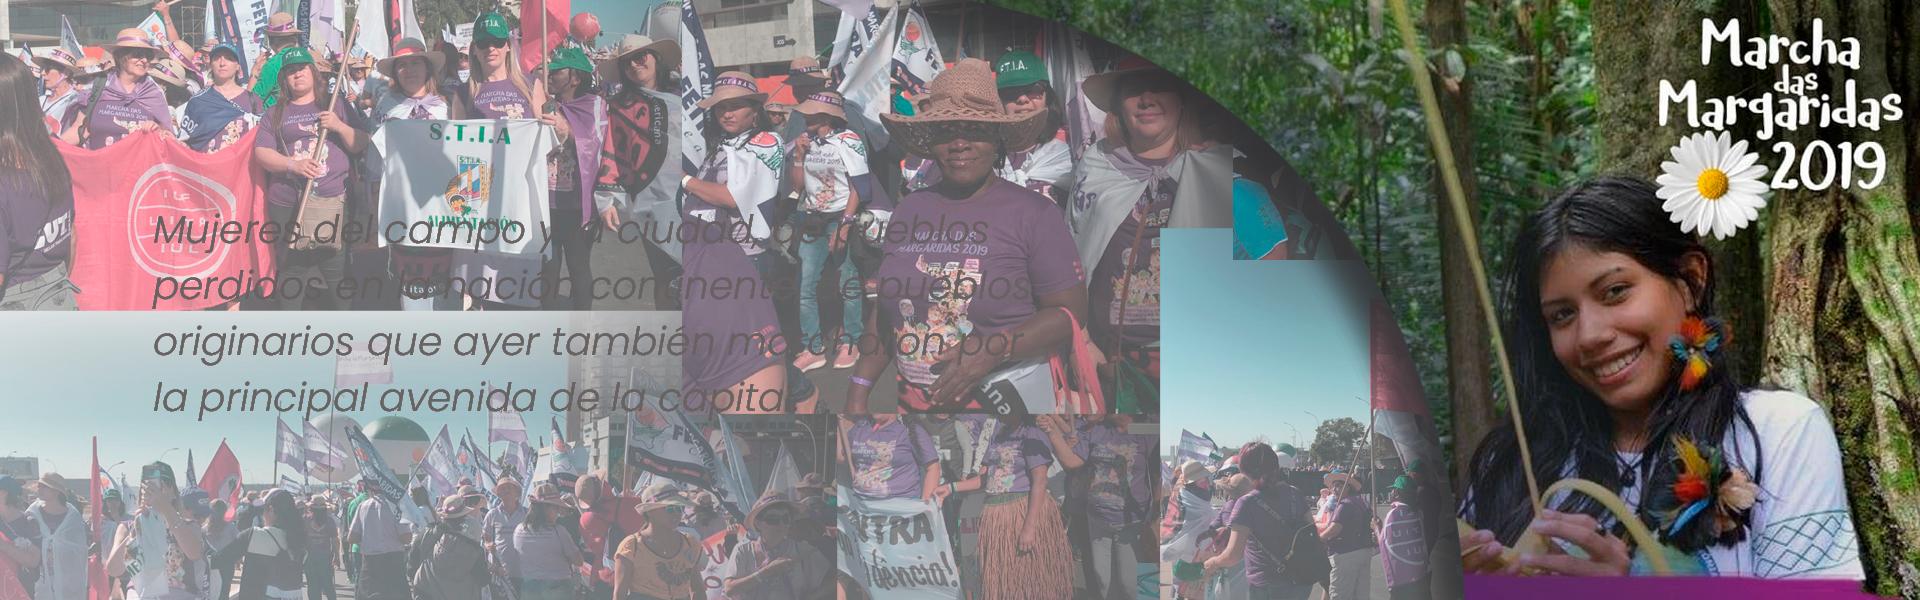 20190822_cabezal-dossier